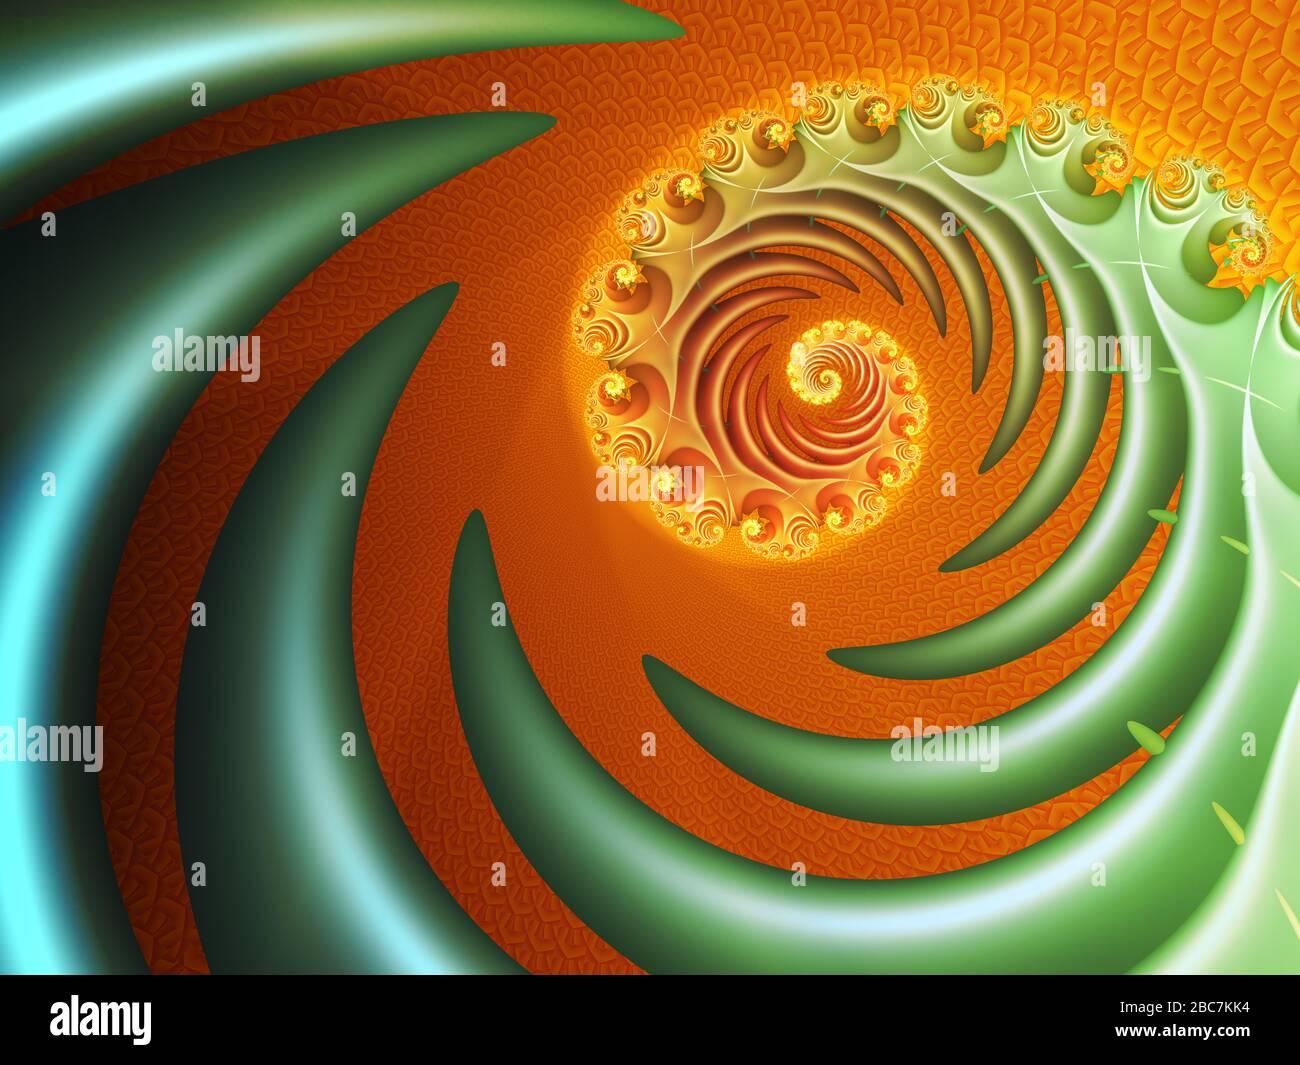 Abstract digital art with spiralling green fern shape Stock Photo